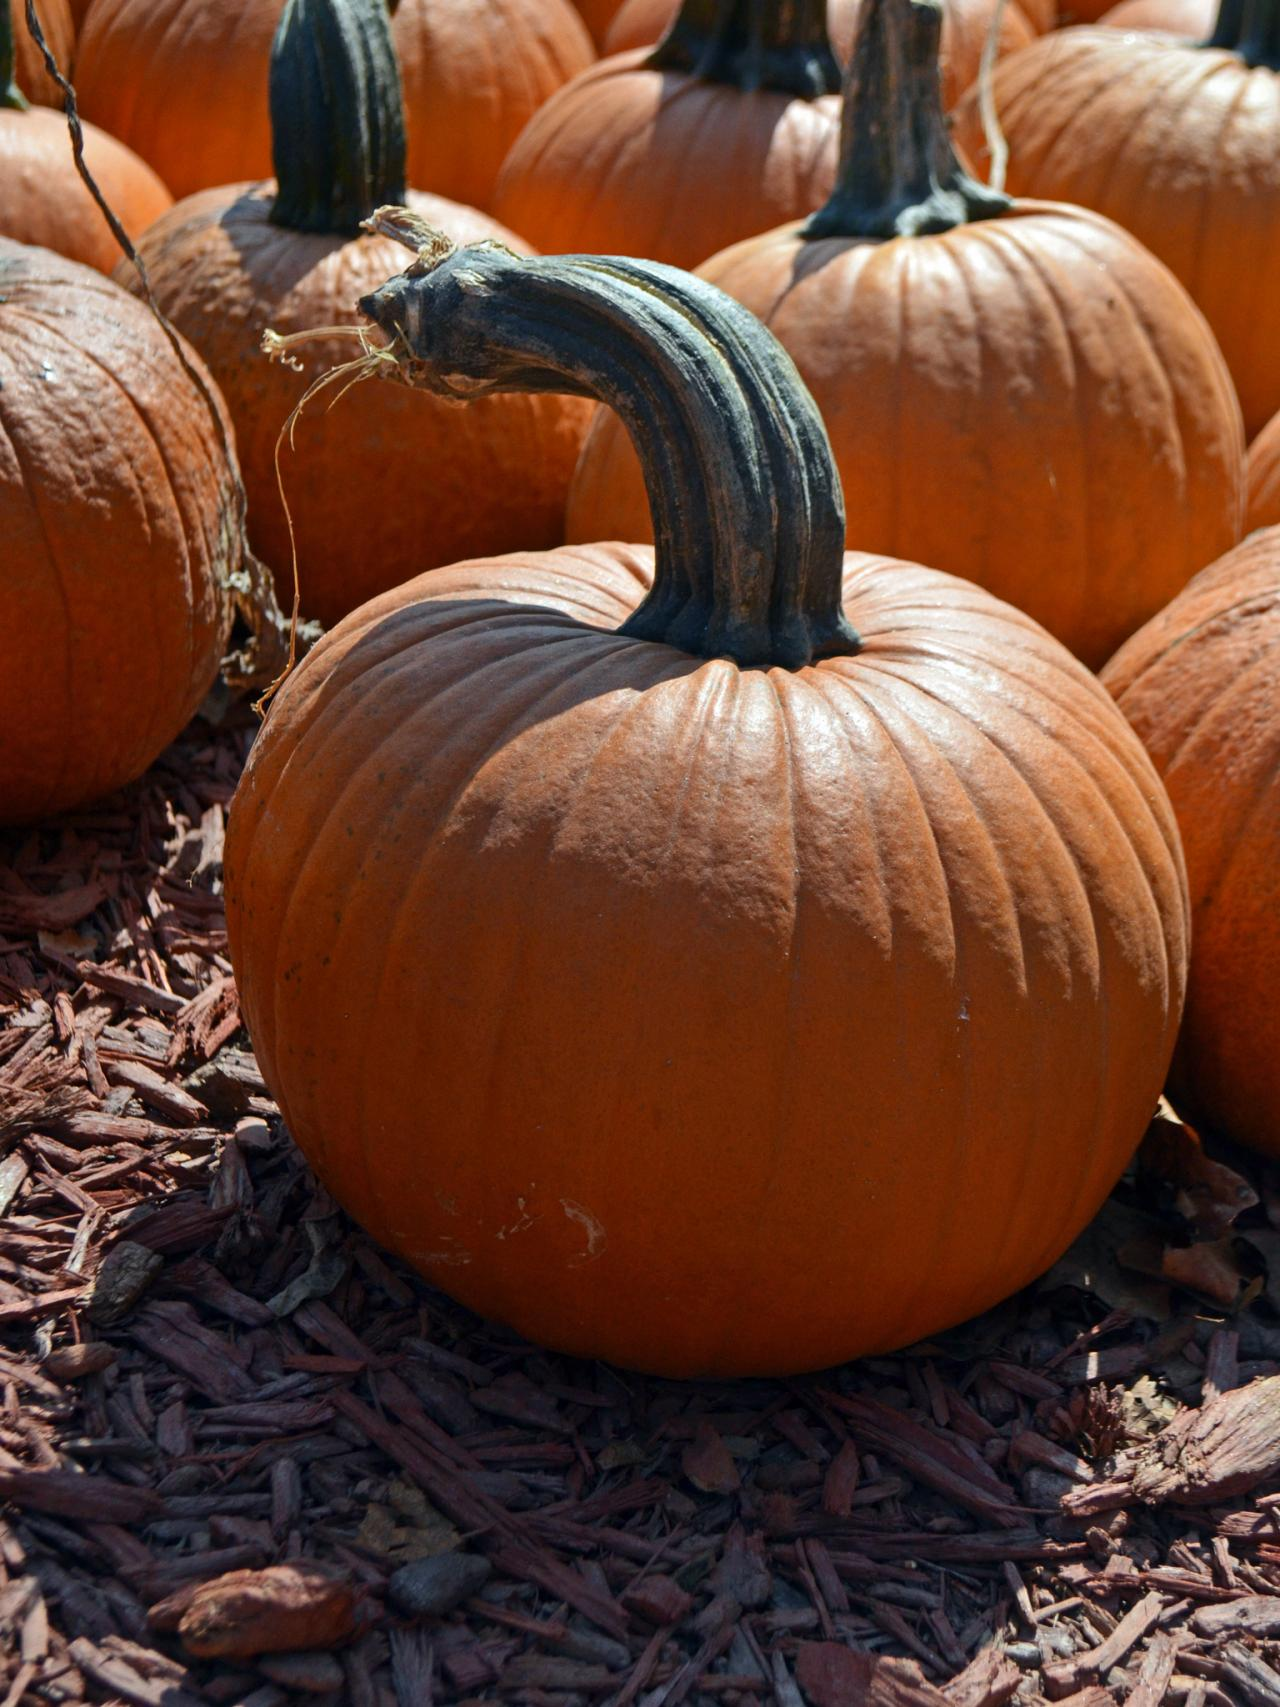 Storing Pumpkins | HGTV